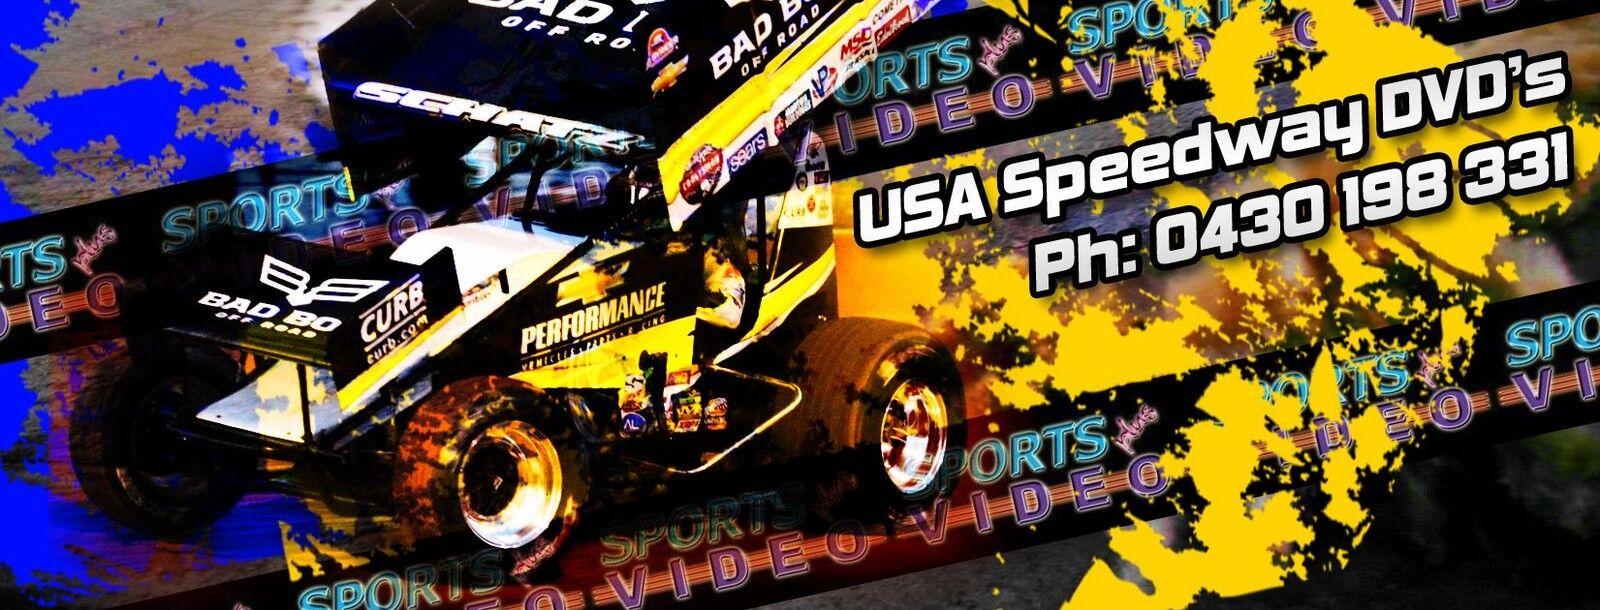 Sports Plus Video Australia